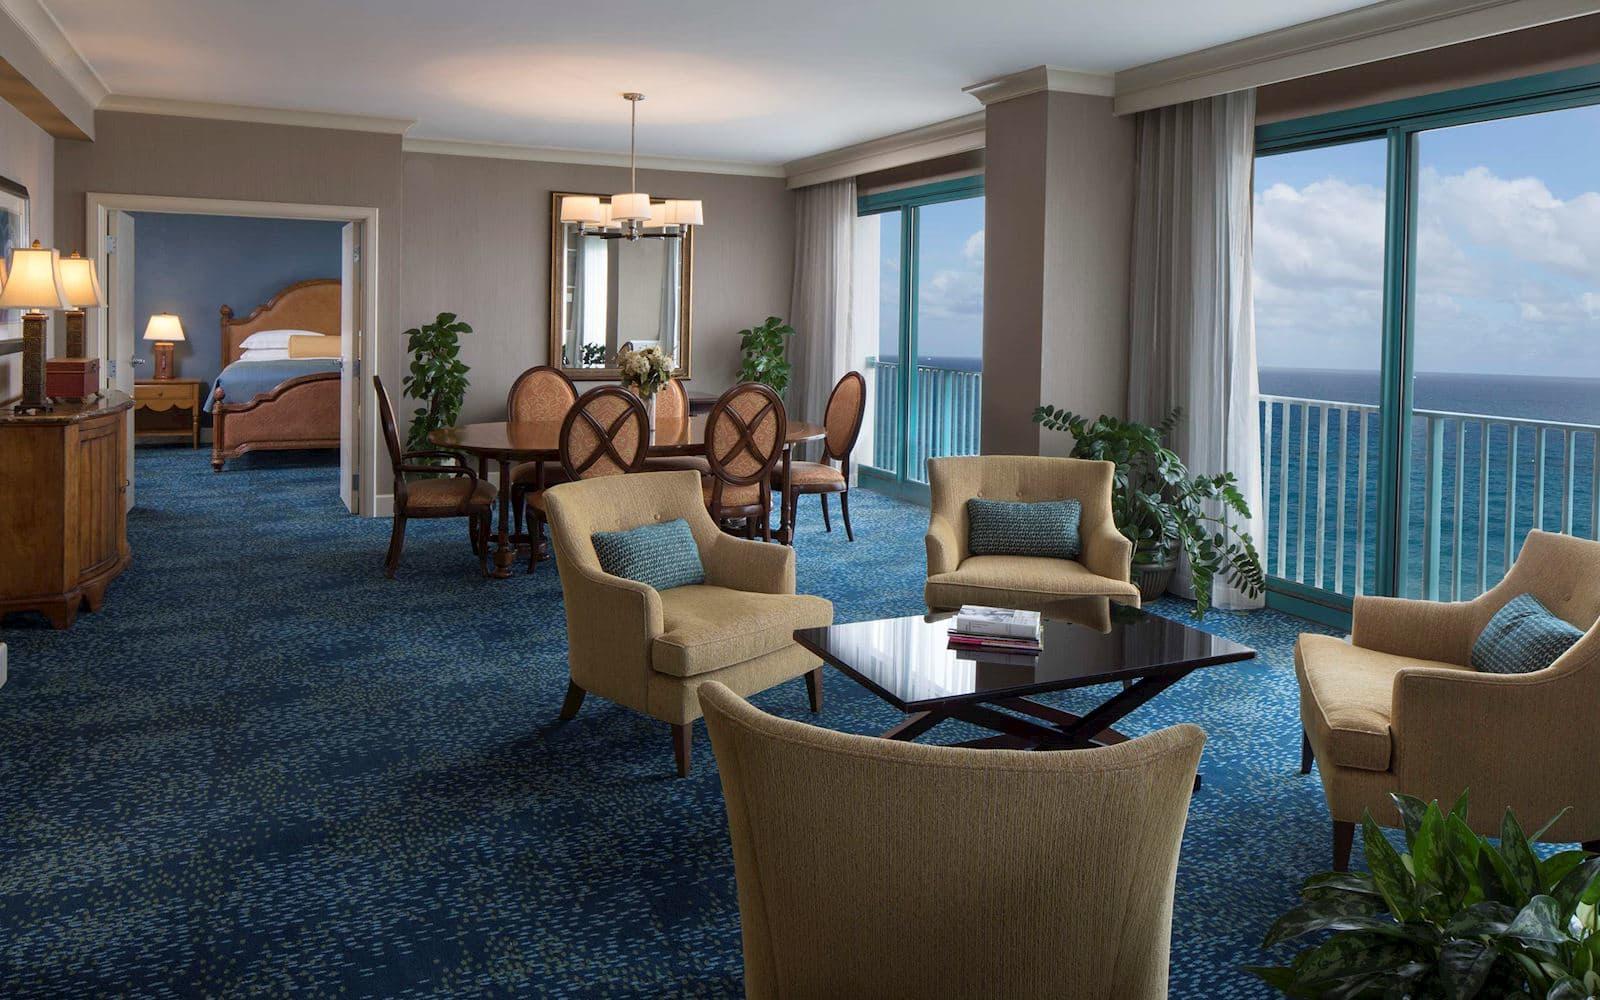 Rooms at Hilton Daytona Beach Oceanfront Resort